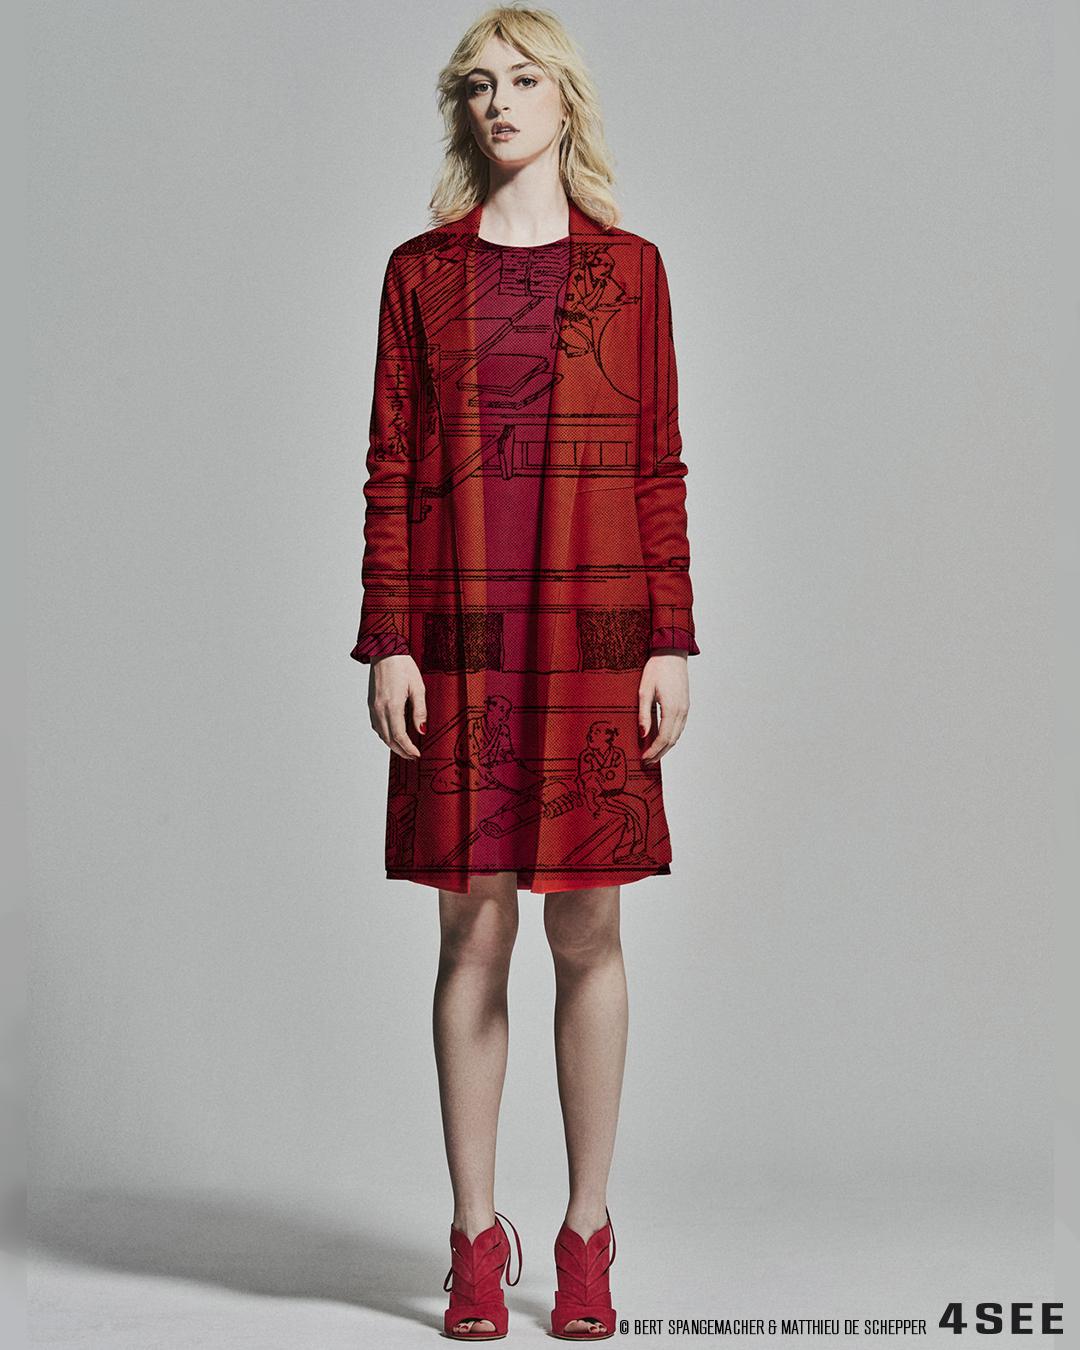 4SEE Opinion - Authentic Fashion Experiences // Photography Bert Spangemacher // Artwork Matthieu de Schepper